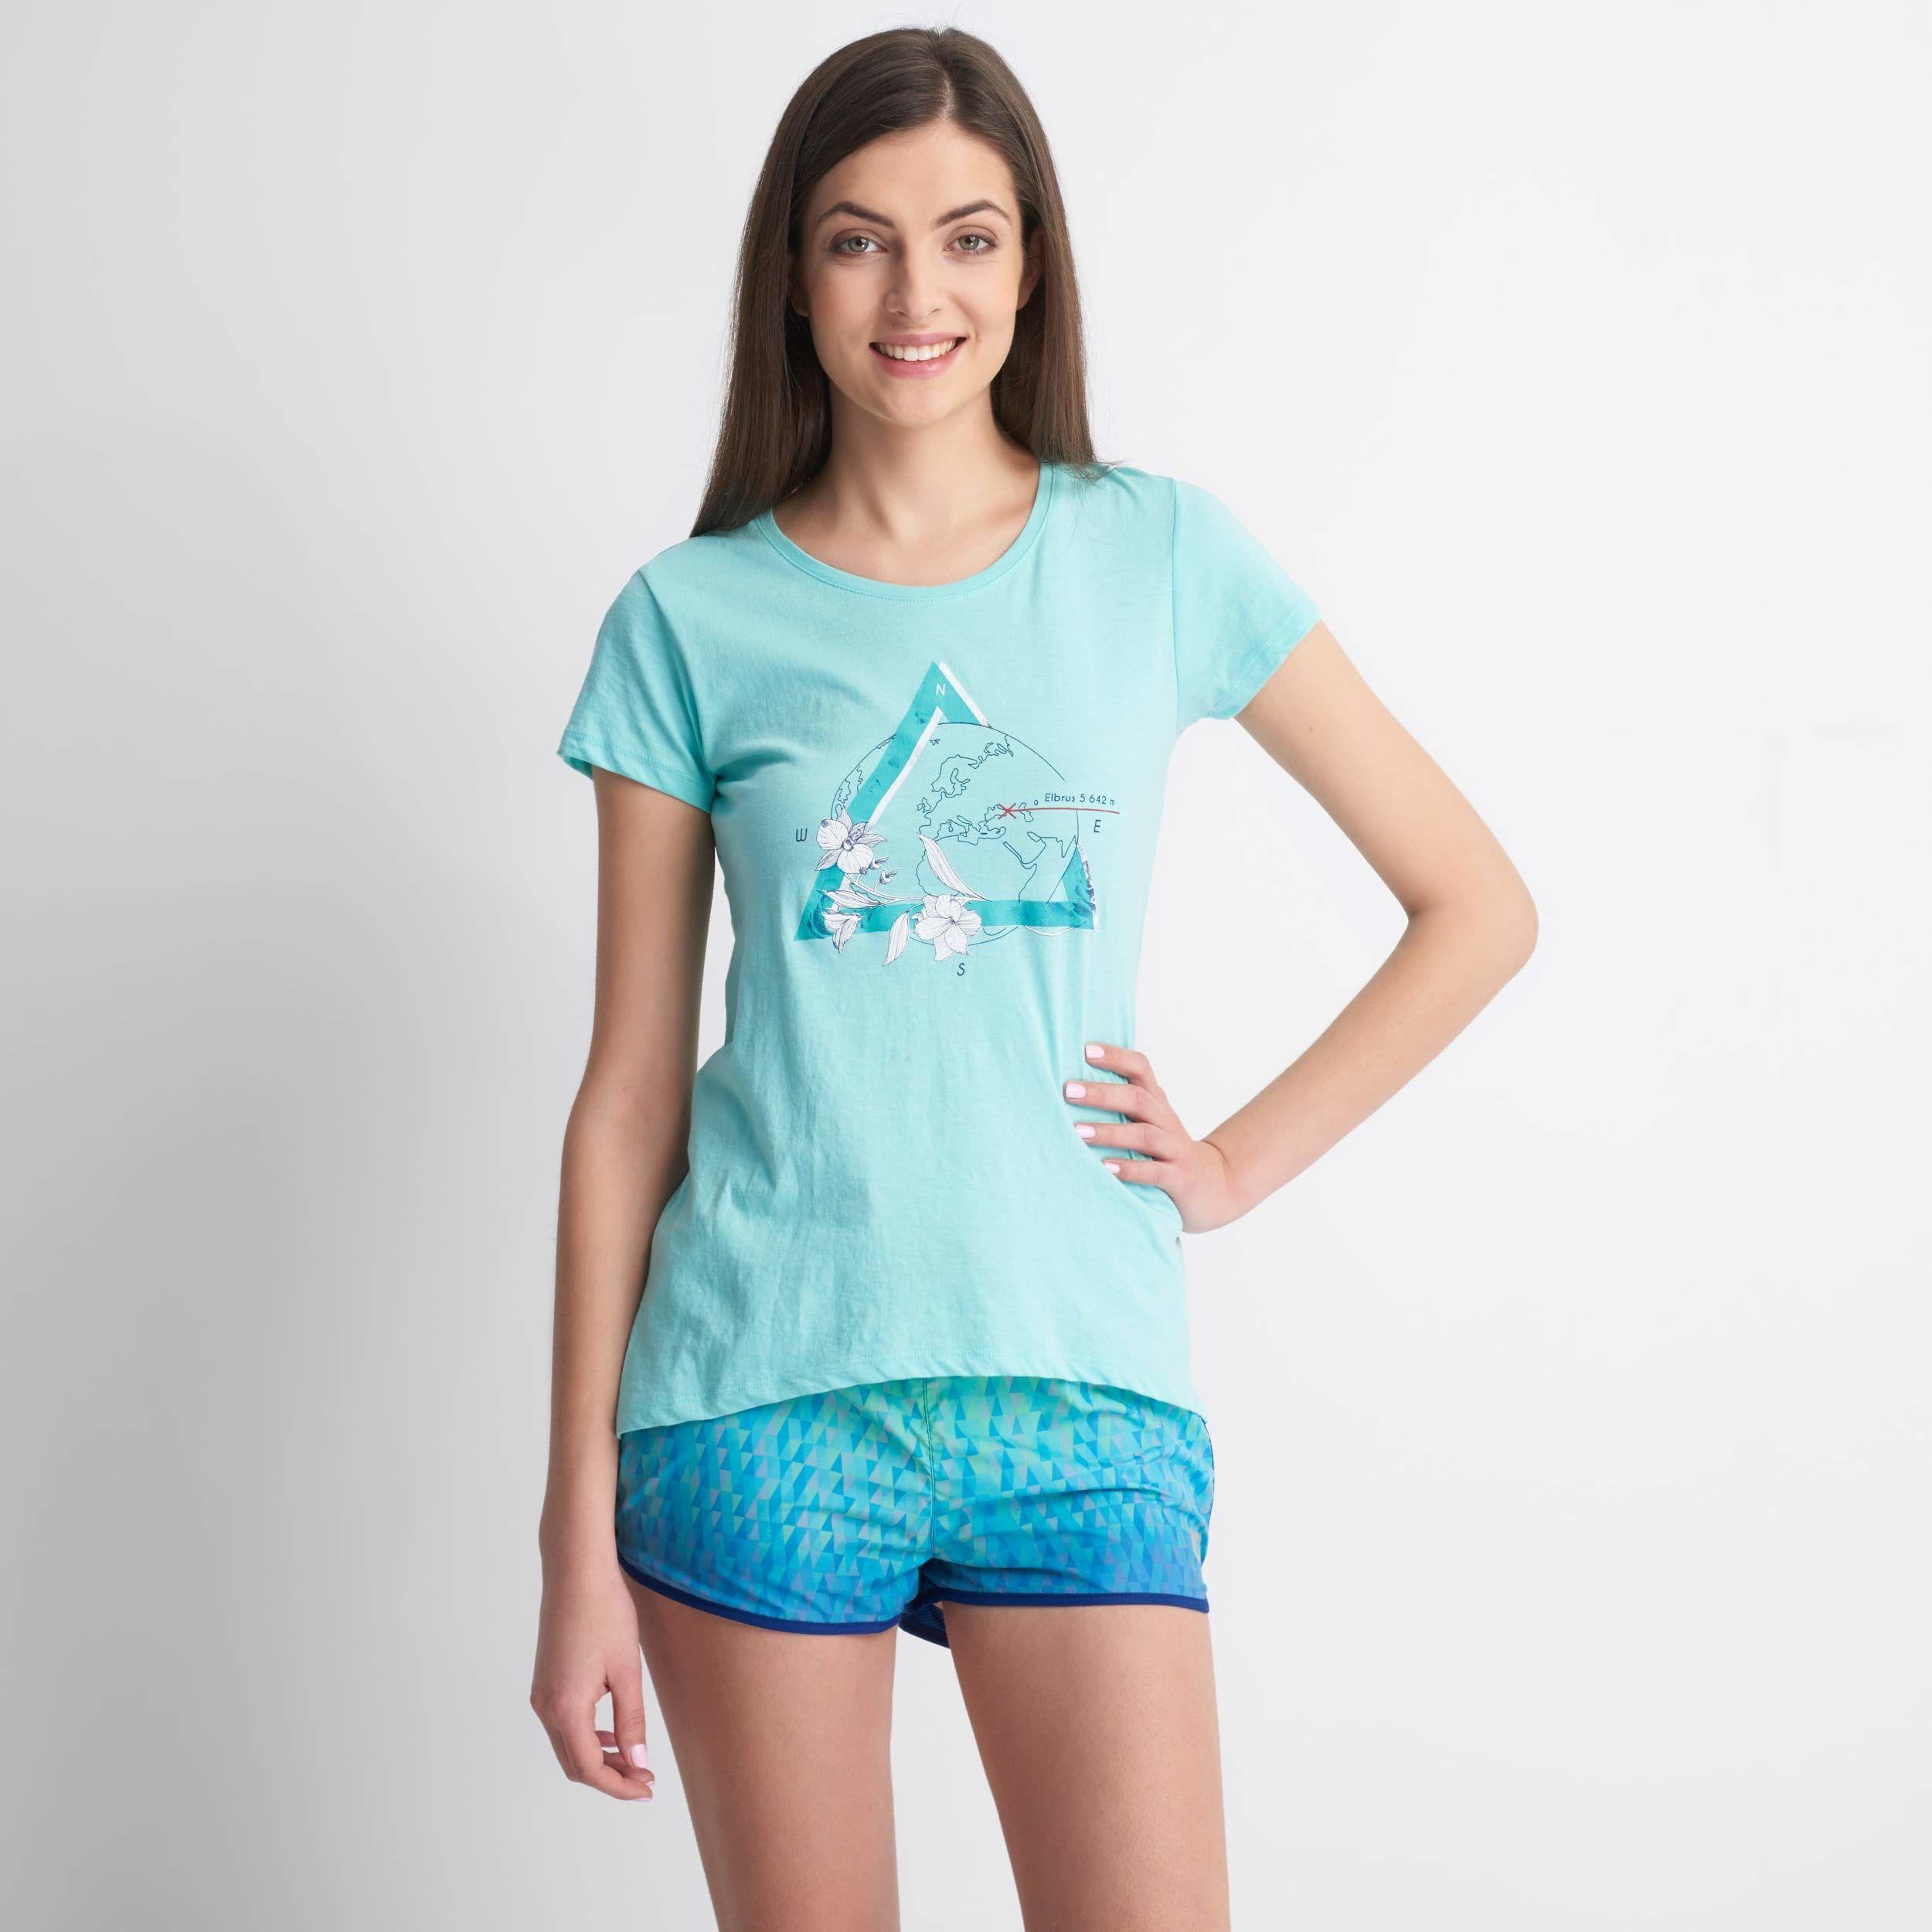 Elbrus damski T-shirt Summit Wo''s turkusowy Tanager Turquoise Melange M